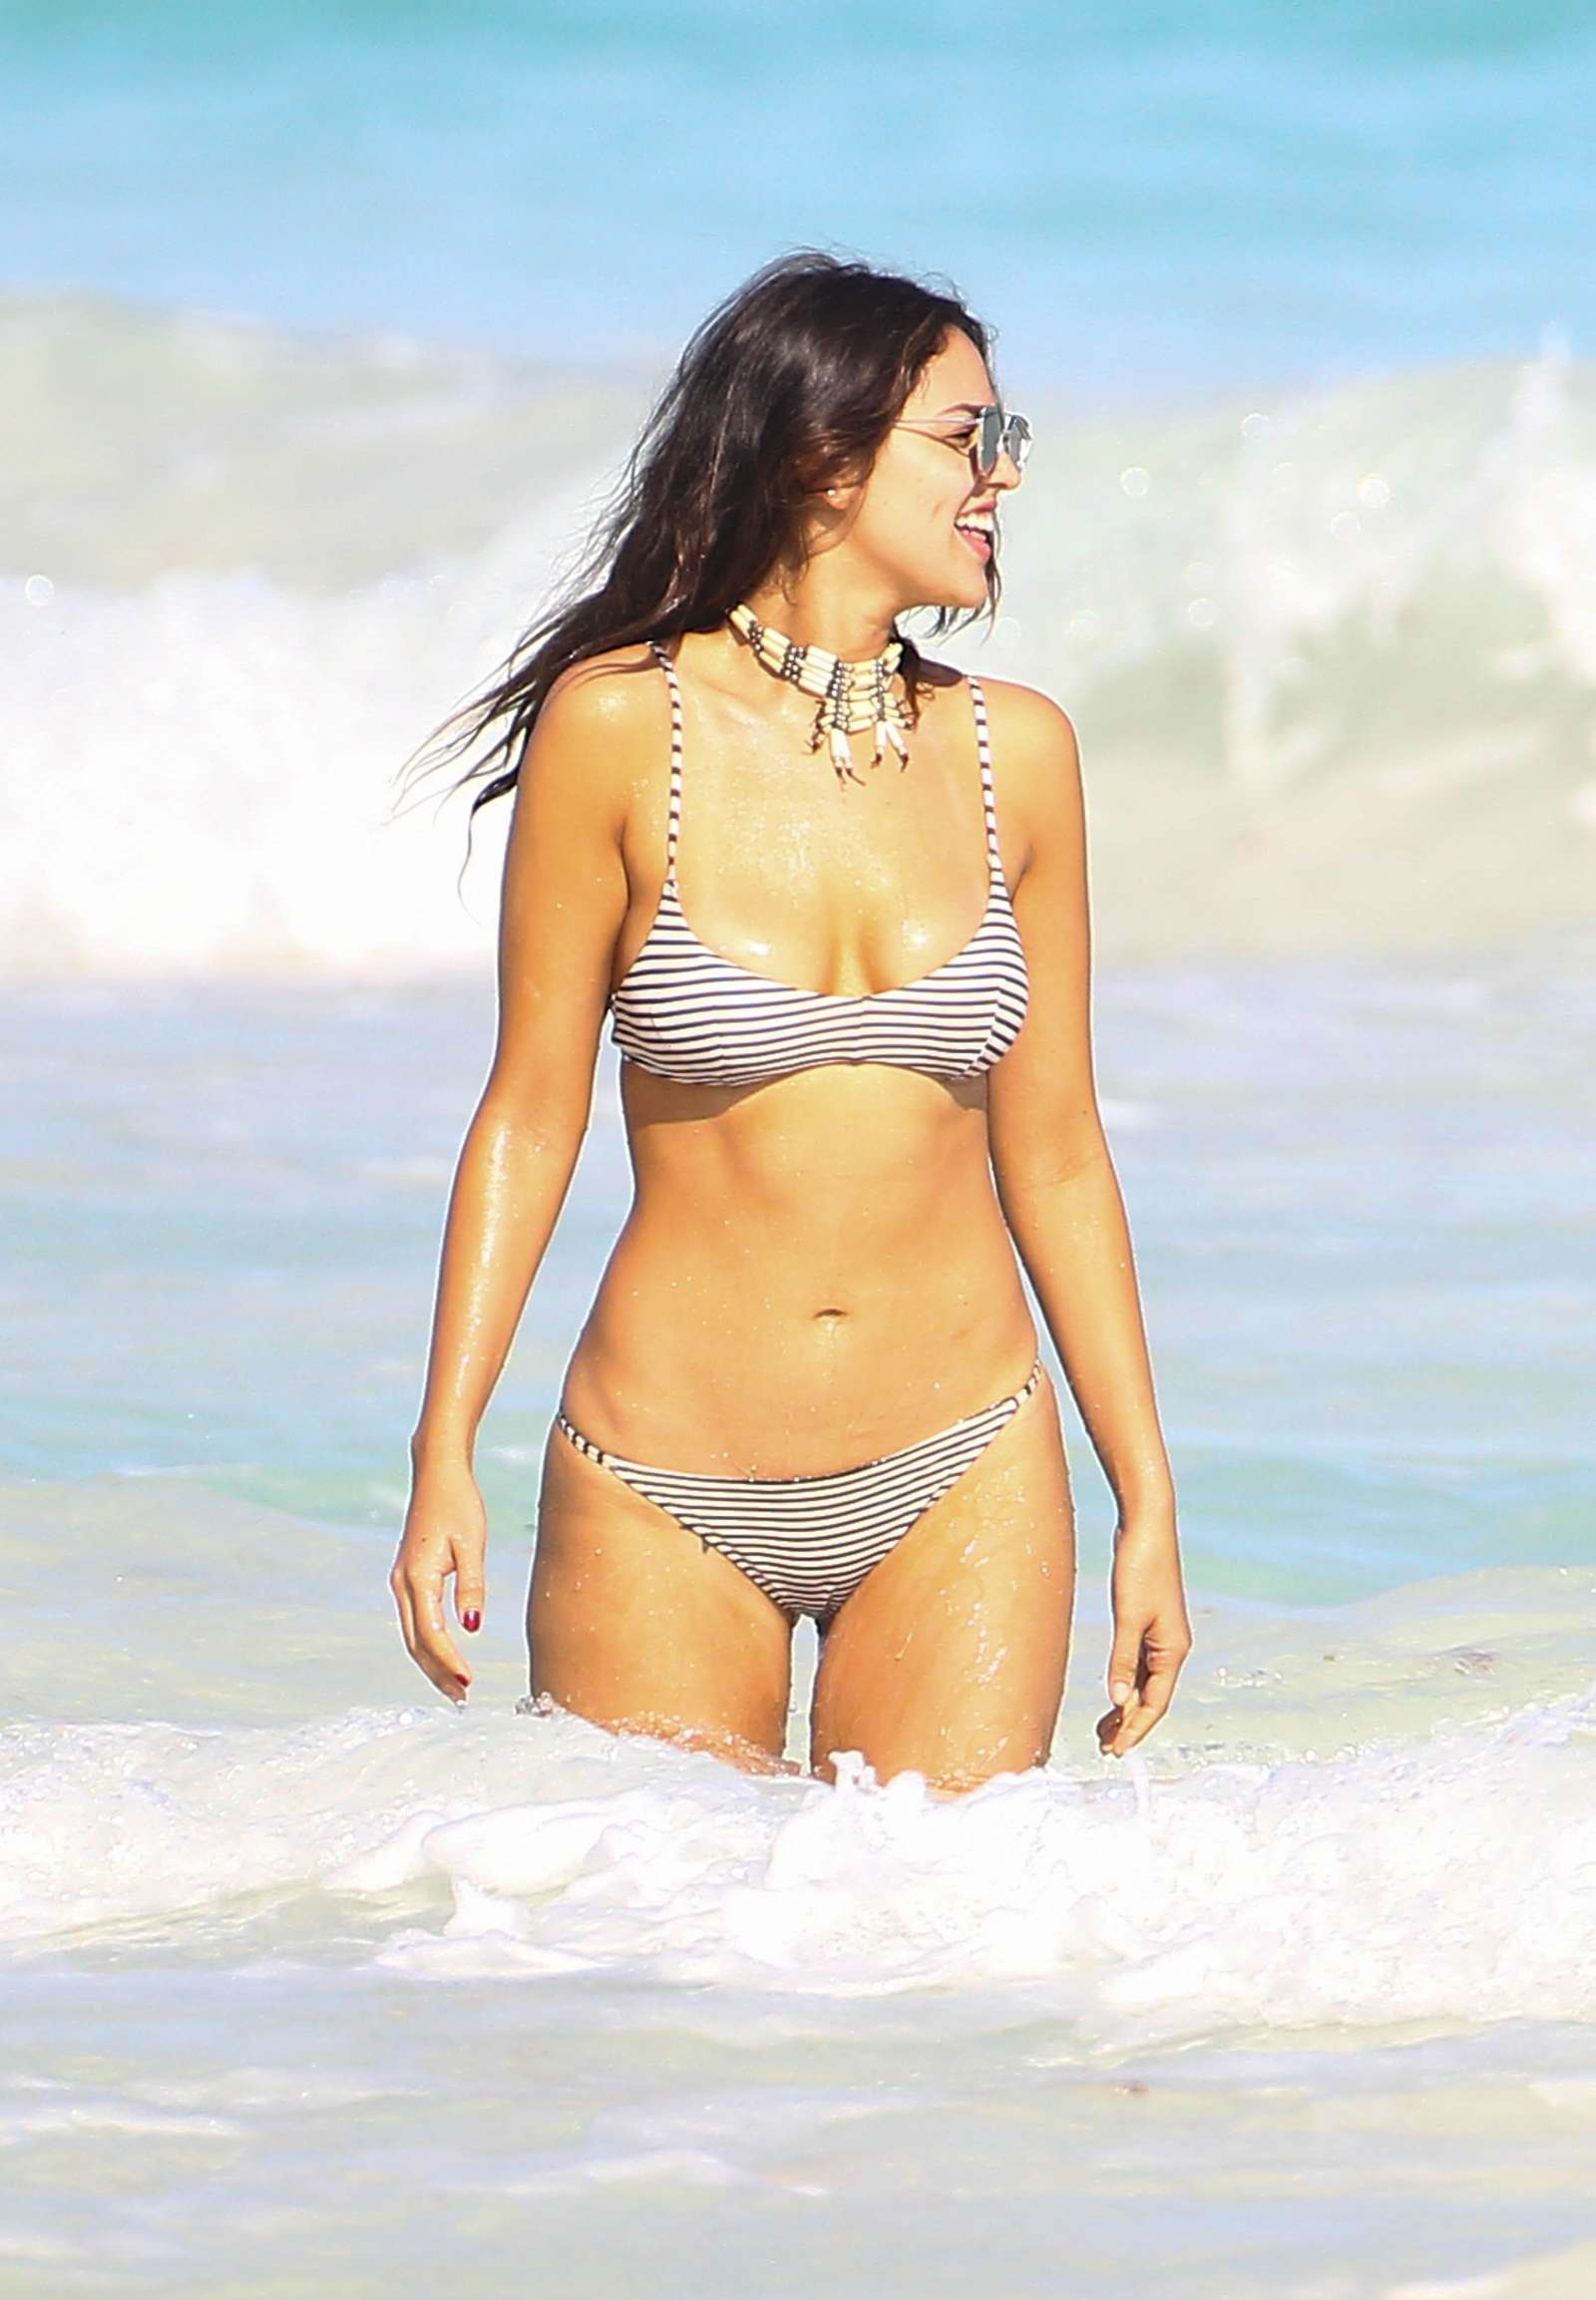 Bikini Eiza Gonzalez nudes (55 photo), Topless, Cleavage, Instagram, cameltoe 2015